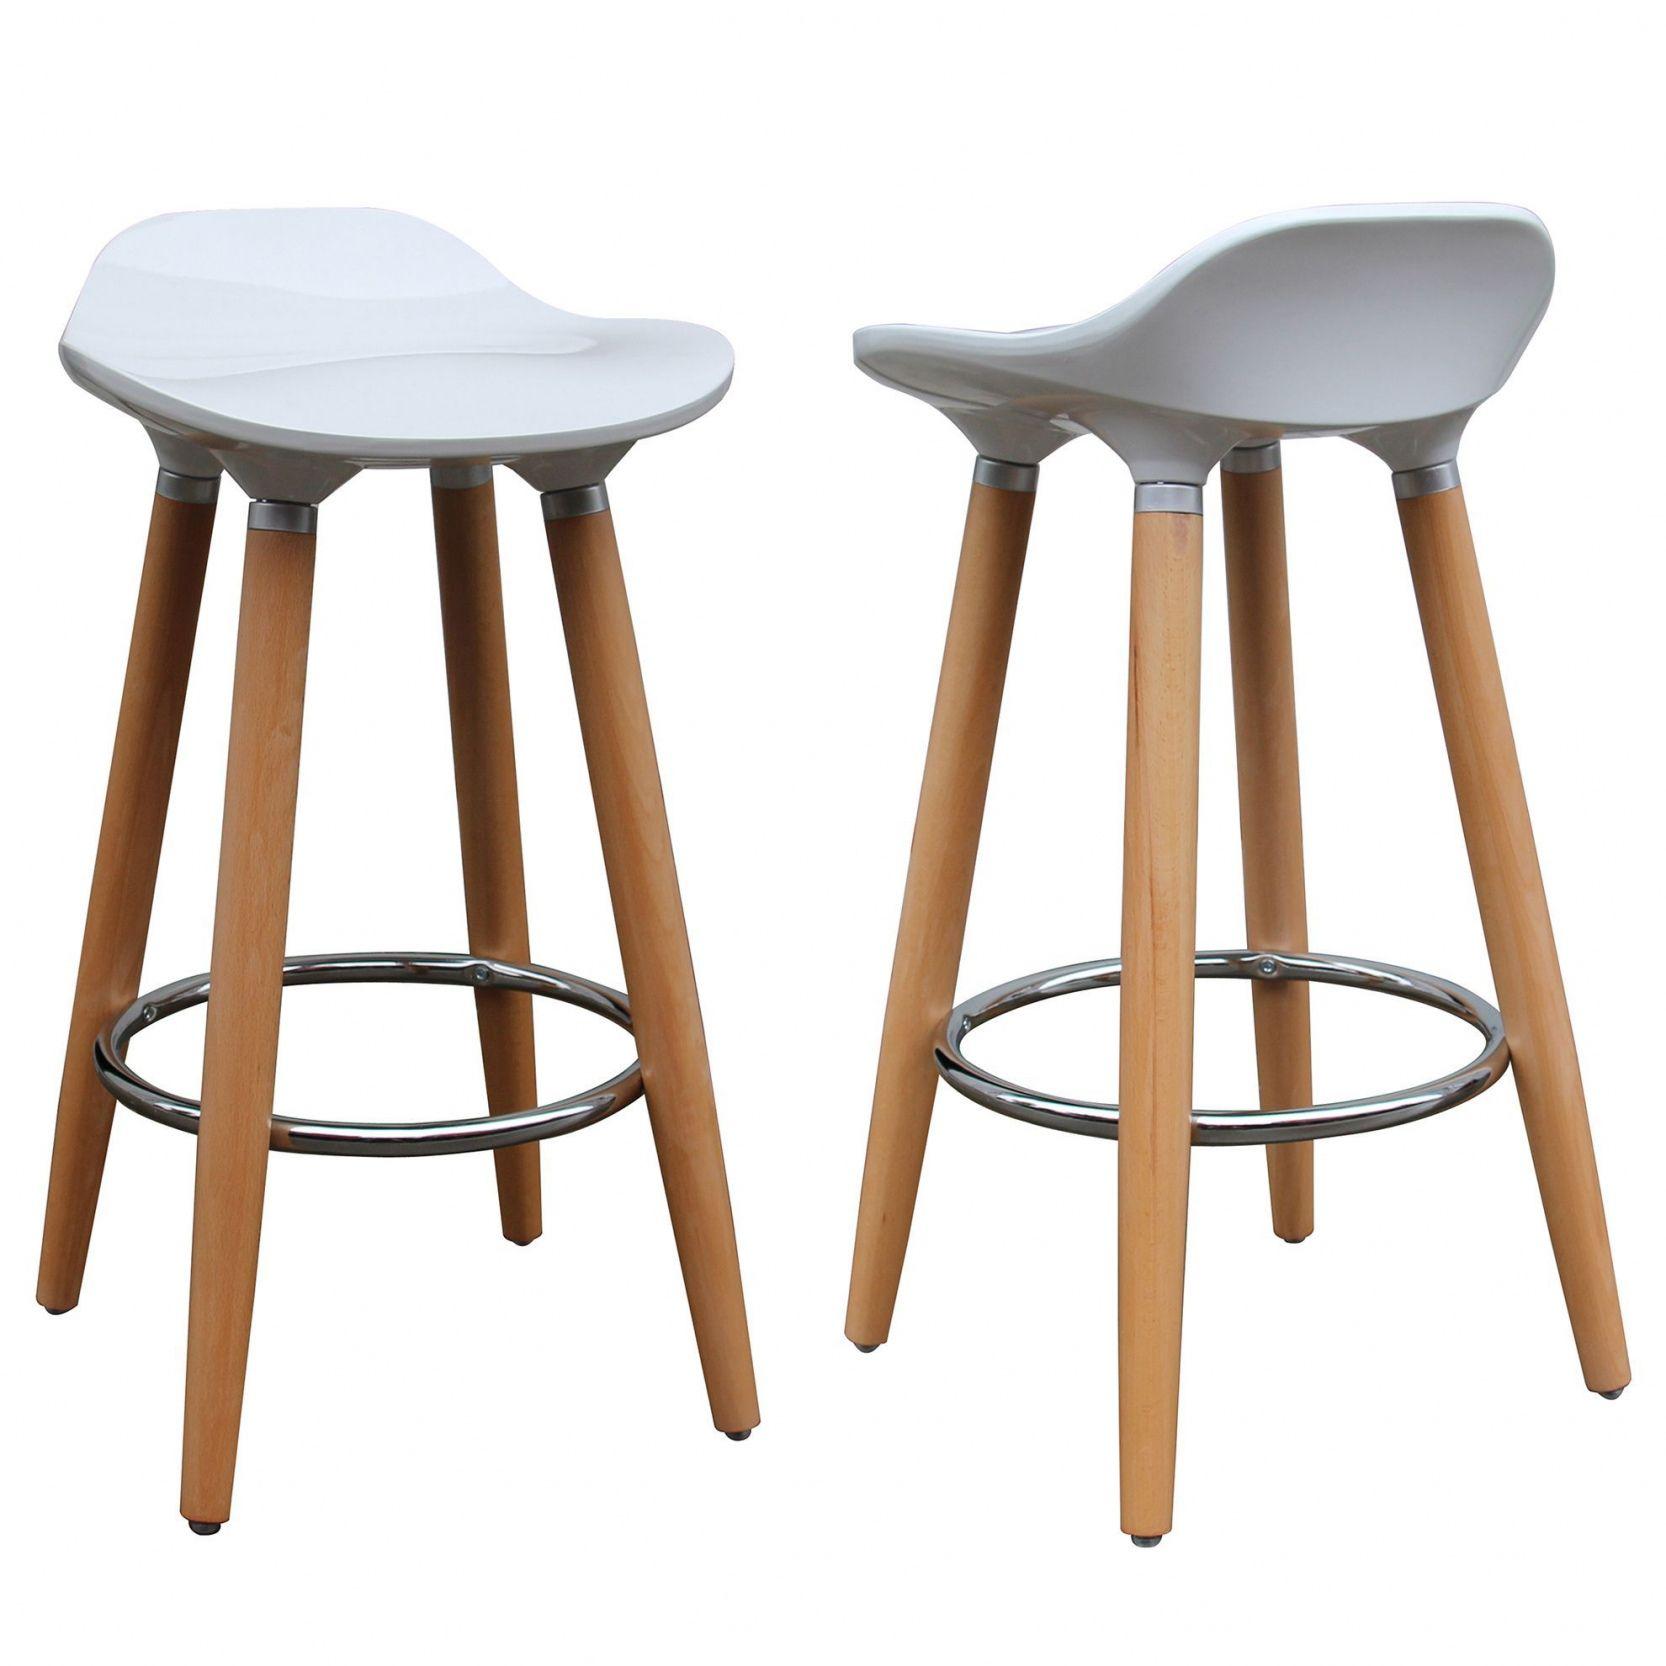 99 26 Bar Stools Wood Modern Affordable Furniture Check more at